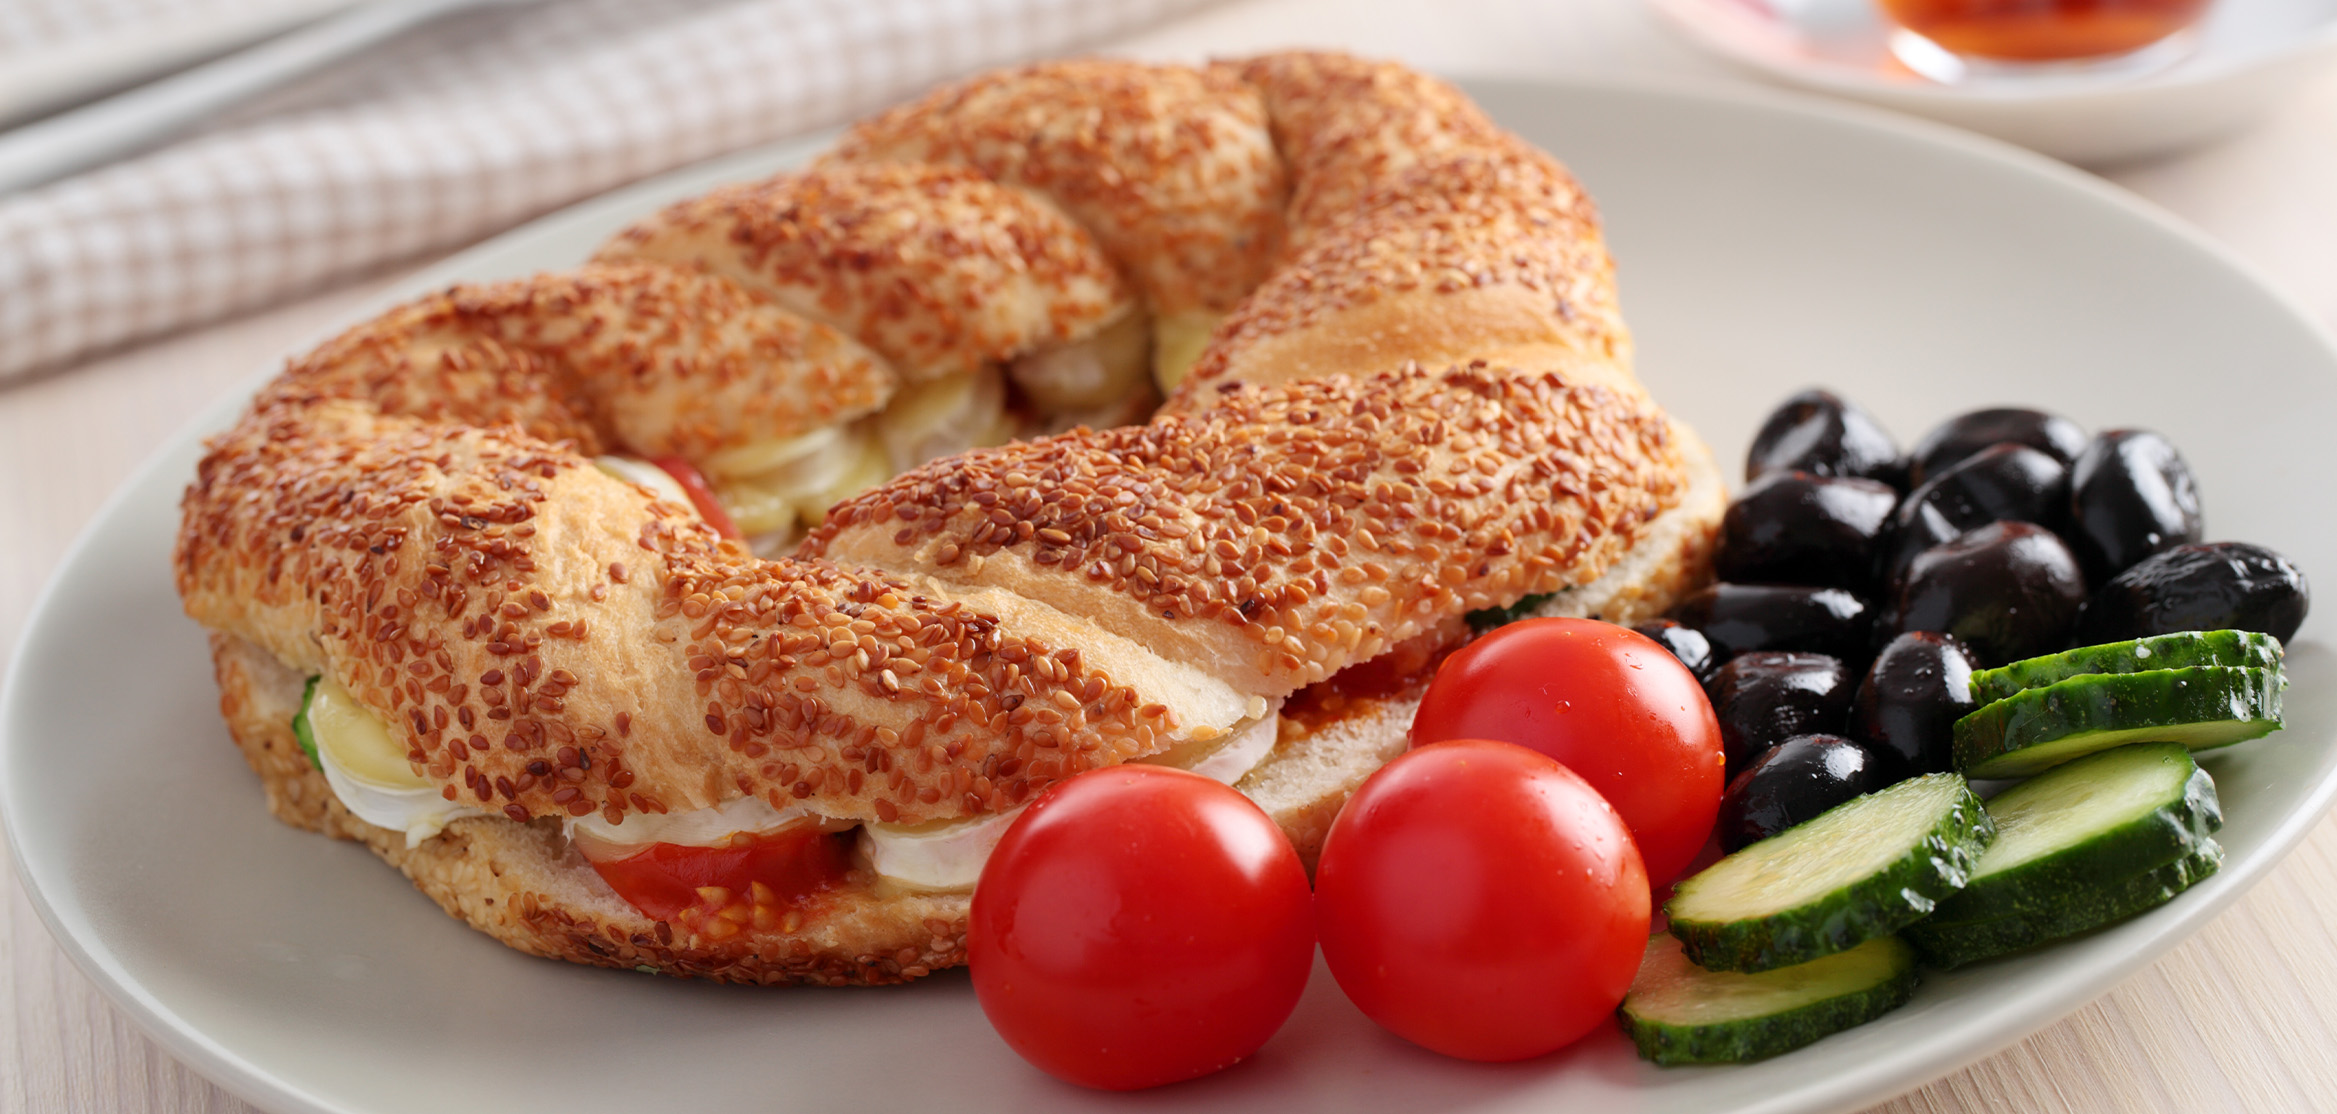 How to prepare Turkish breakfast?